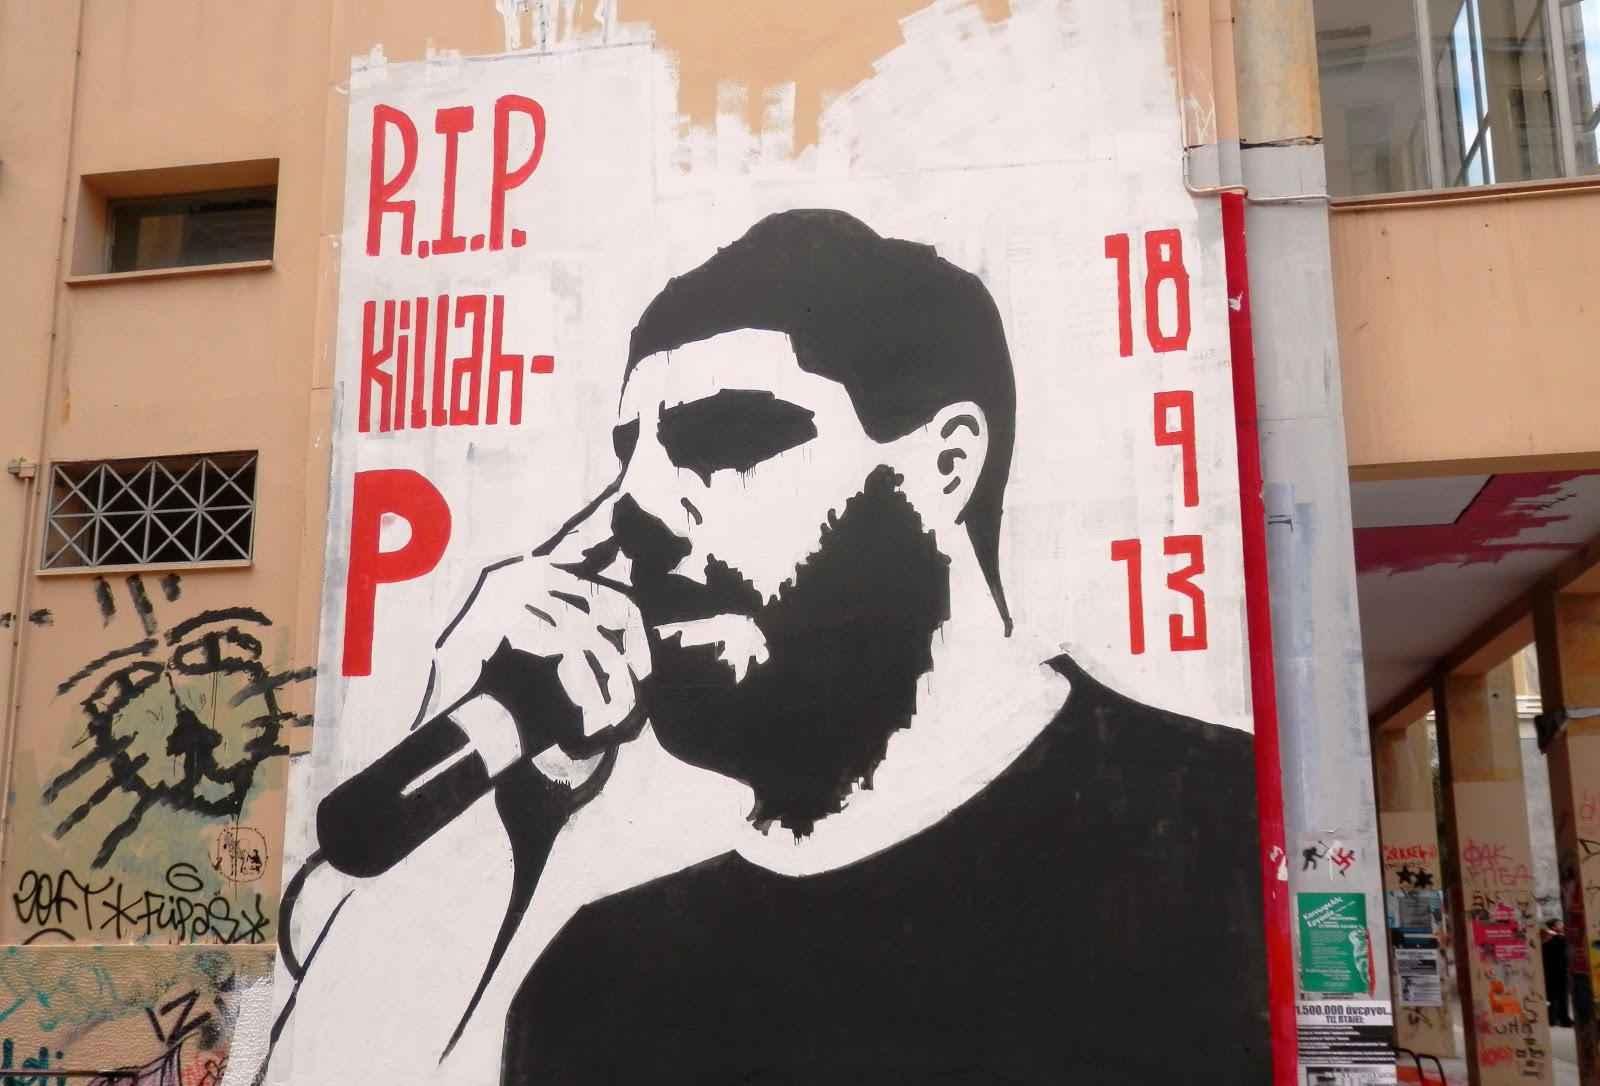 R.I.P.-Killah-P-18.9.2013-Fyssas